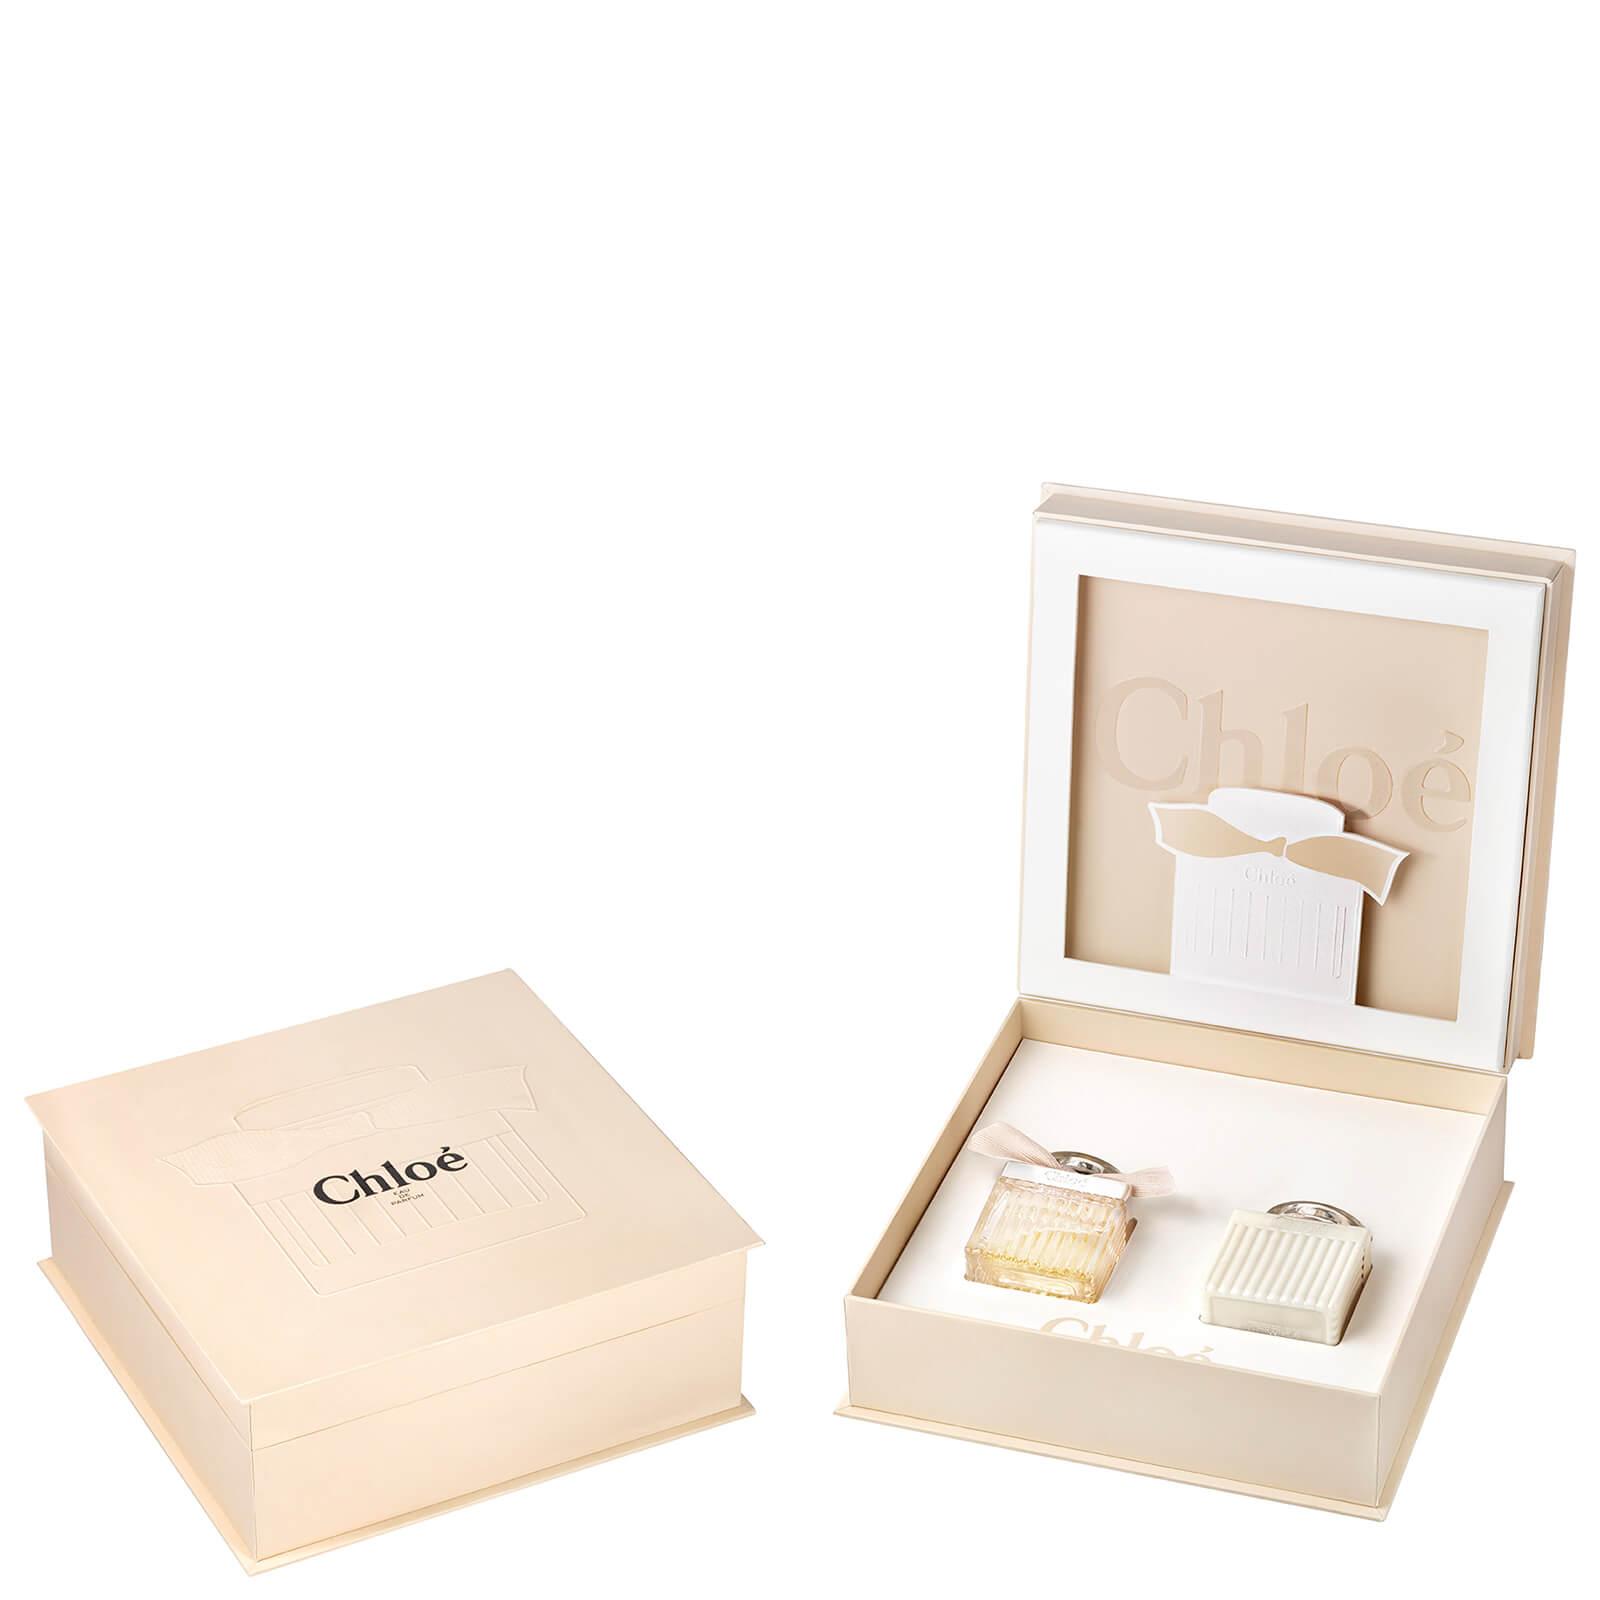 6820855c8f03 Chloé Signature Gift Set 50ml | Free Shipping | Lookfantastic